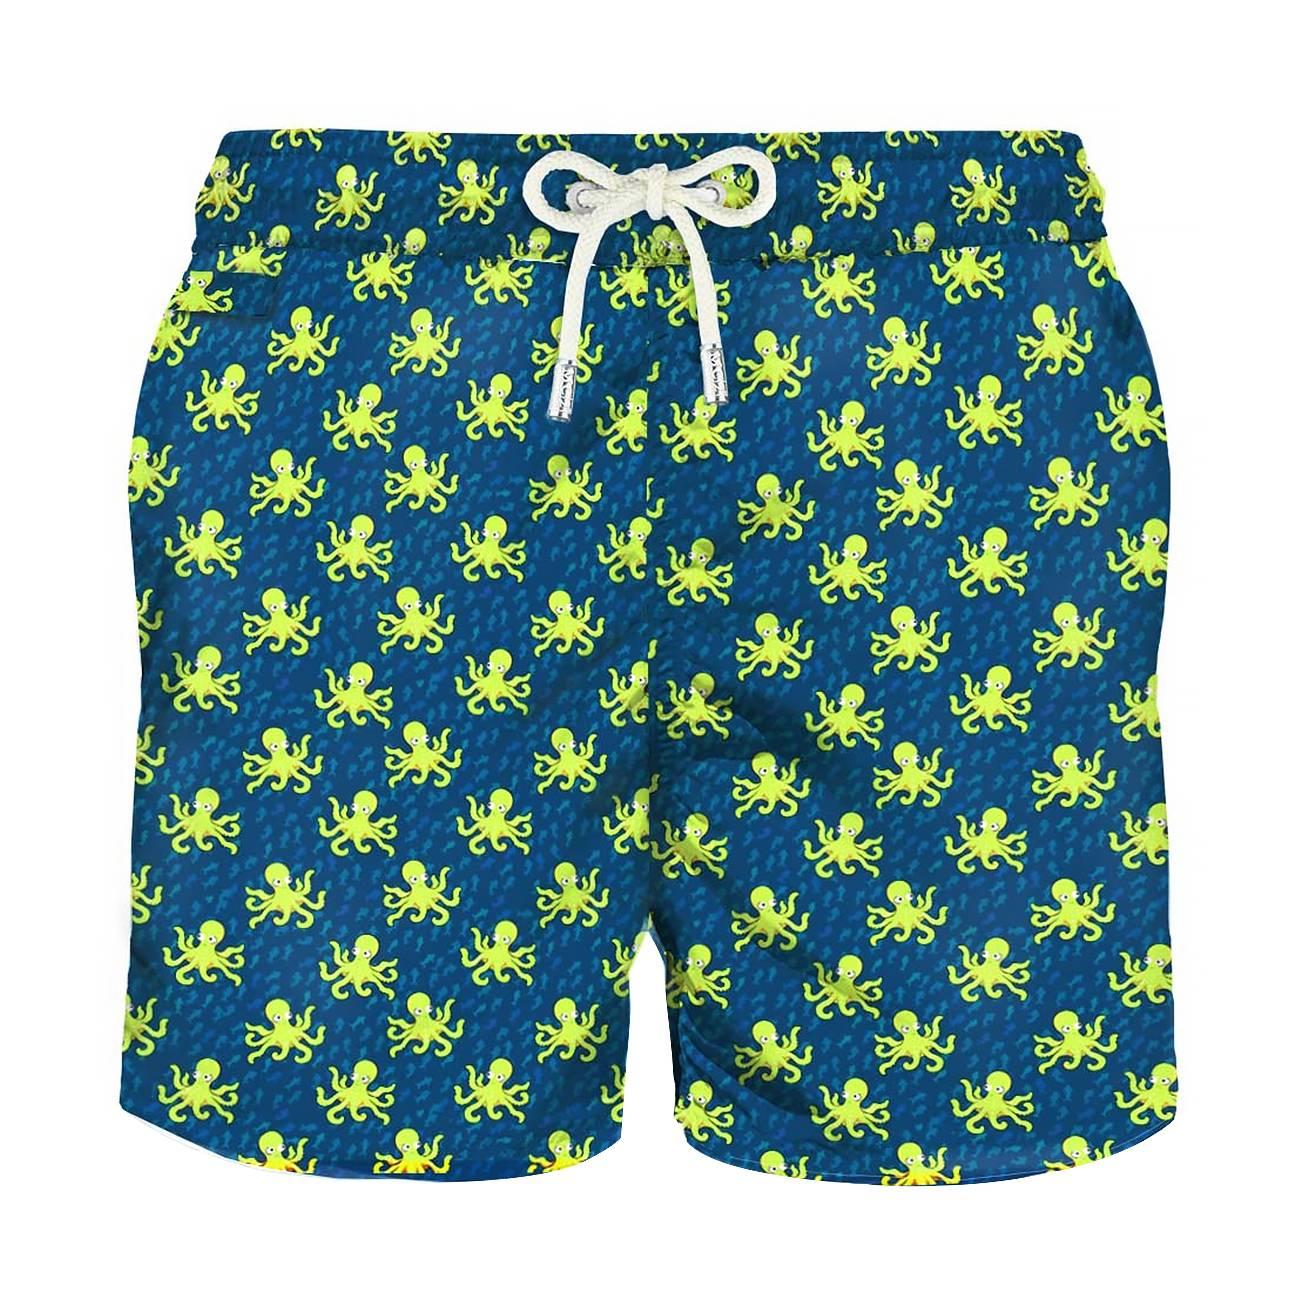 Micro Octopus Light Fabric Swim Shorts S imagine